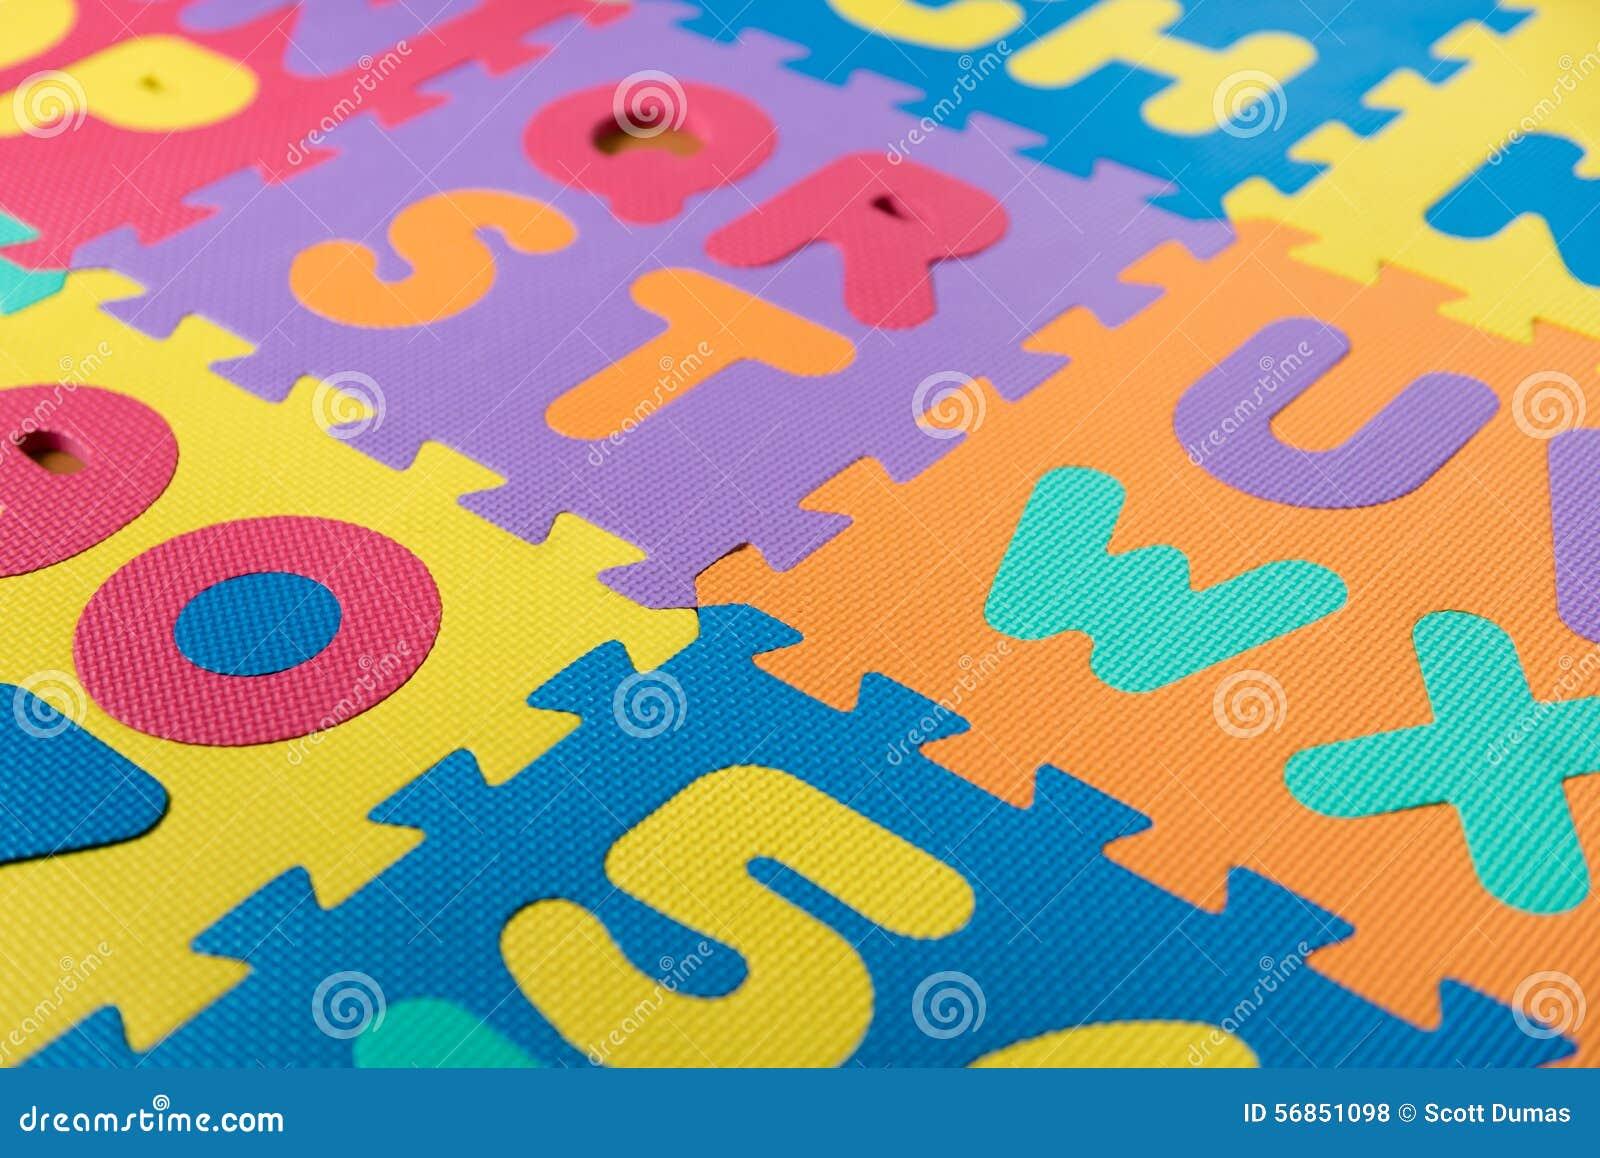 Abc Foam Puzzle Stock Photo Image 56851098